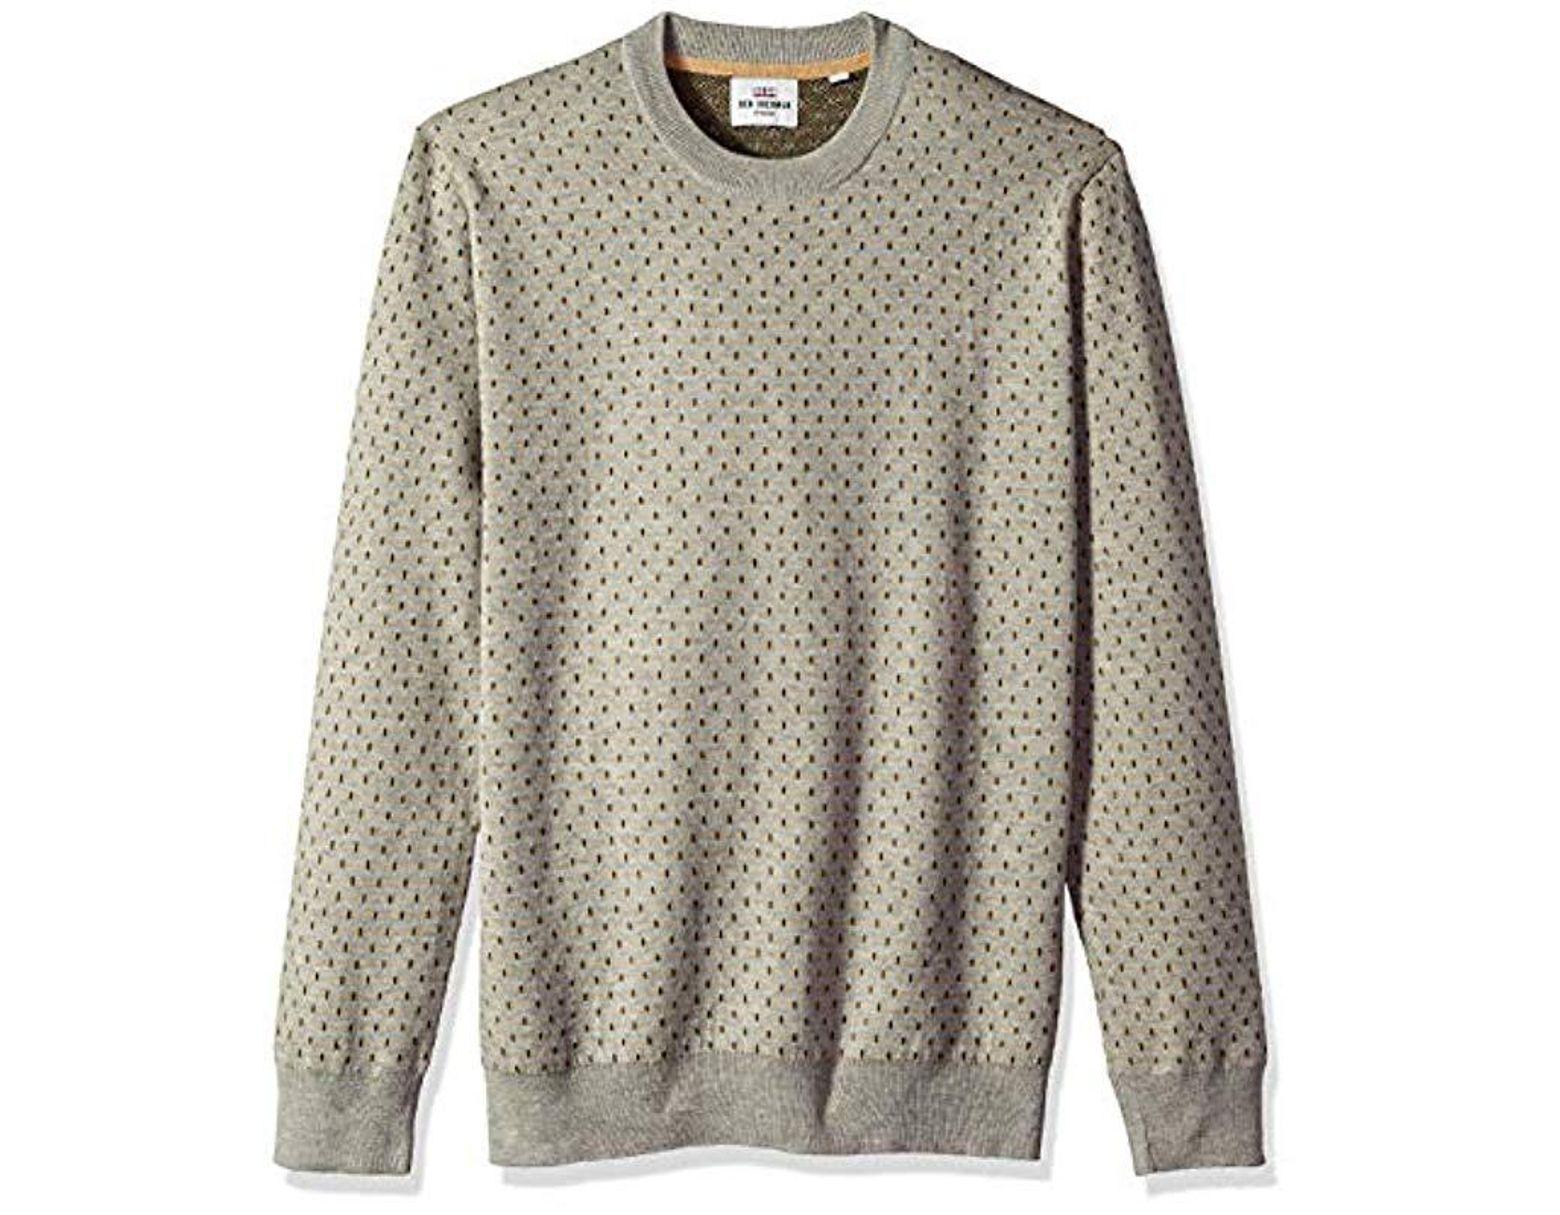 aabfa770034 Men's White Tipping Geo Crew Sweater